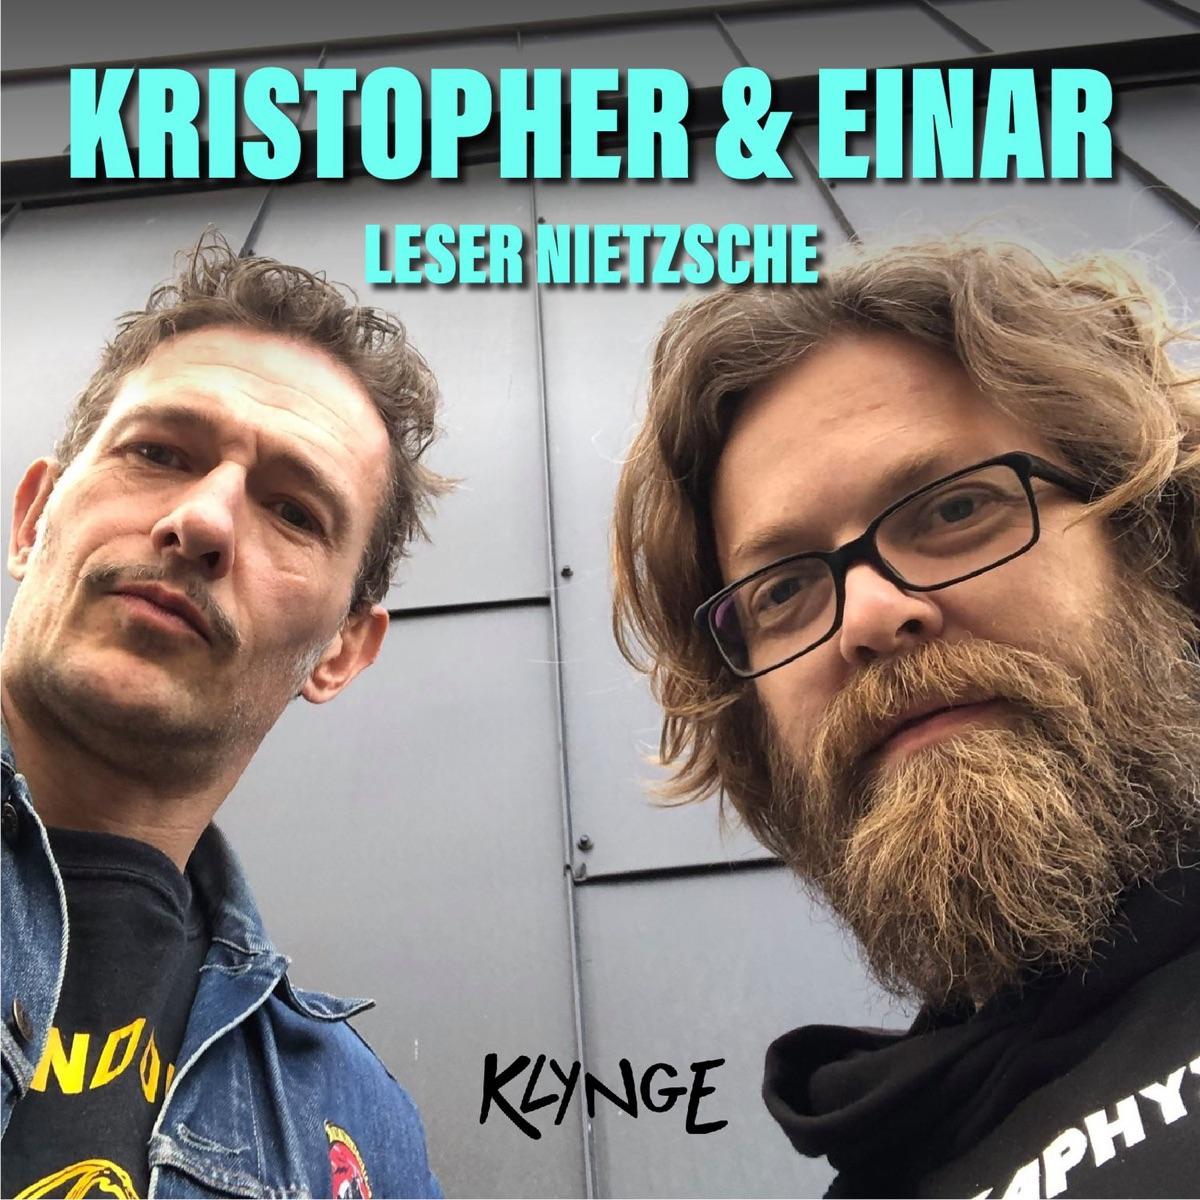 Kristopher og Einar leser Nietzsche